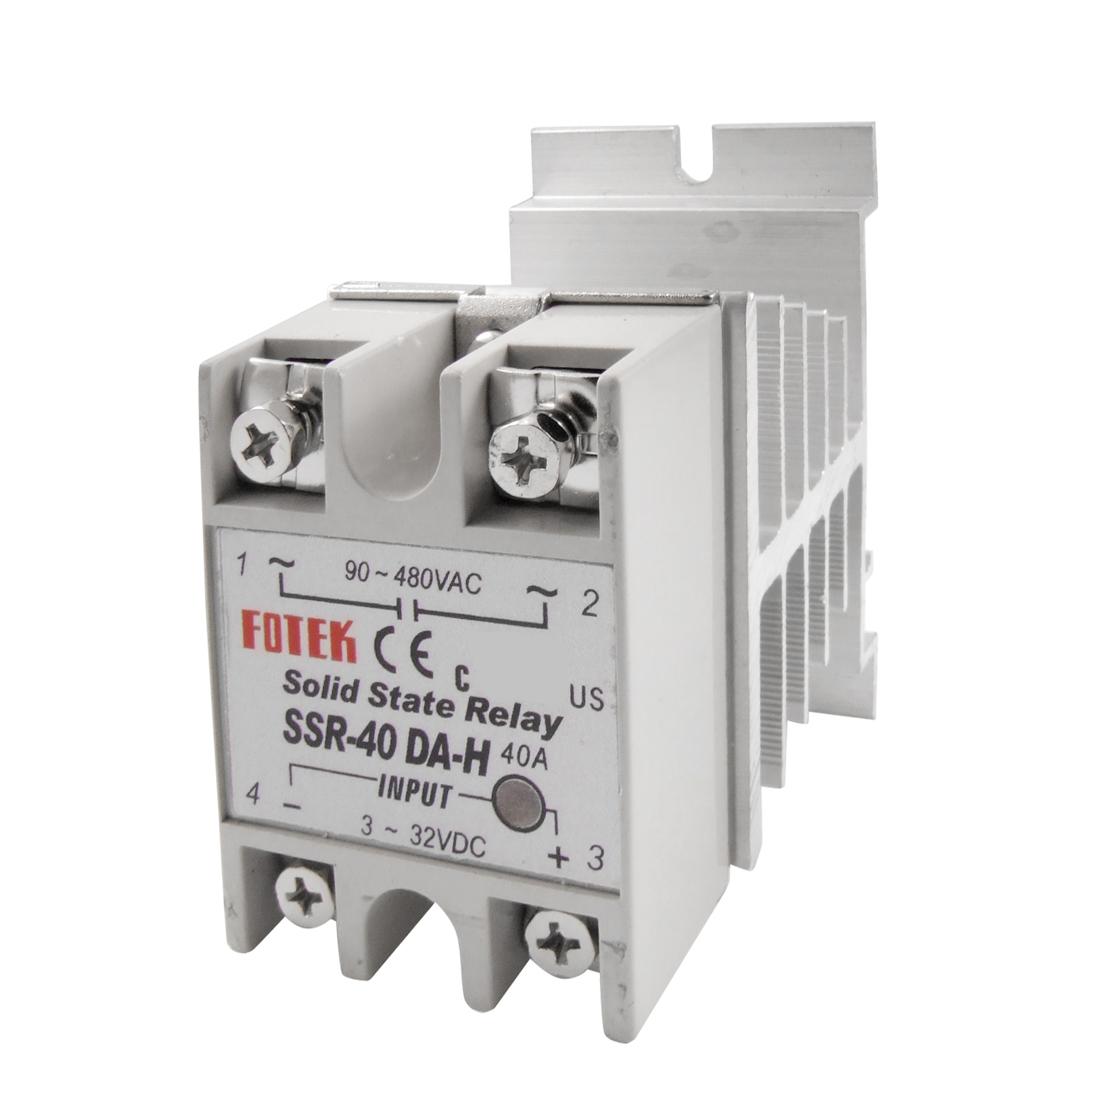 Temprature Control Solid State Relay SSR 40A 3-32V DC 90-480V AC w Heat Sink